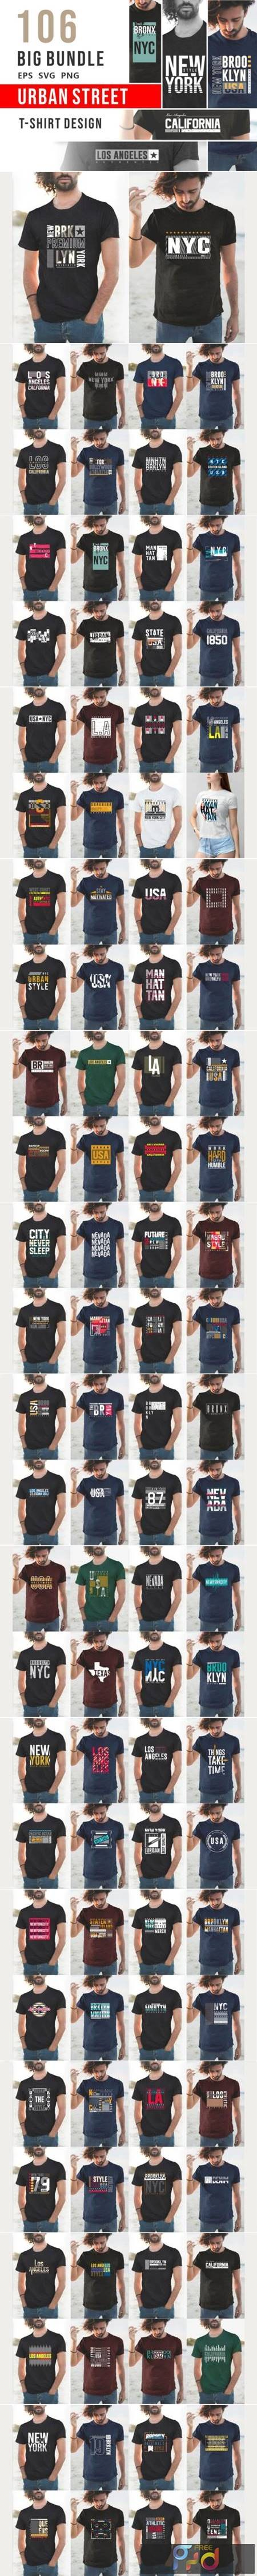 Urban Street T-shirt Design Bundle 6726832 1